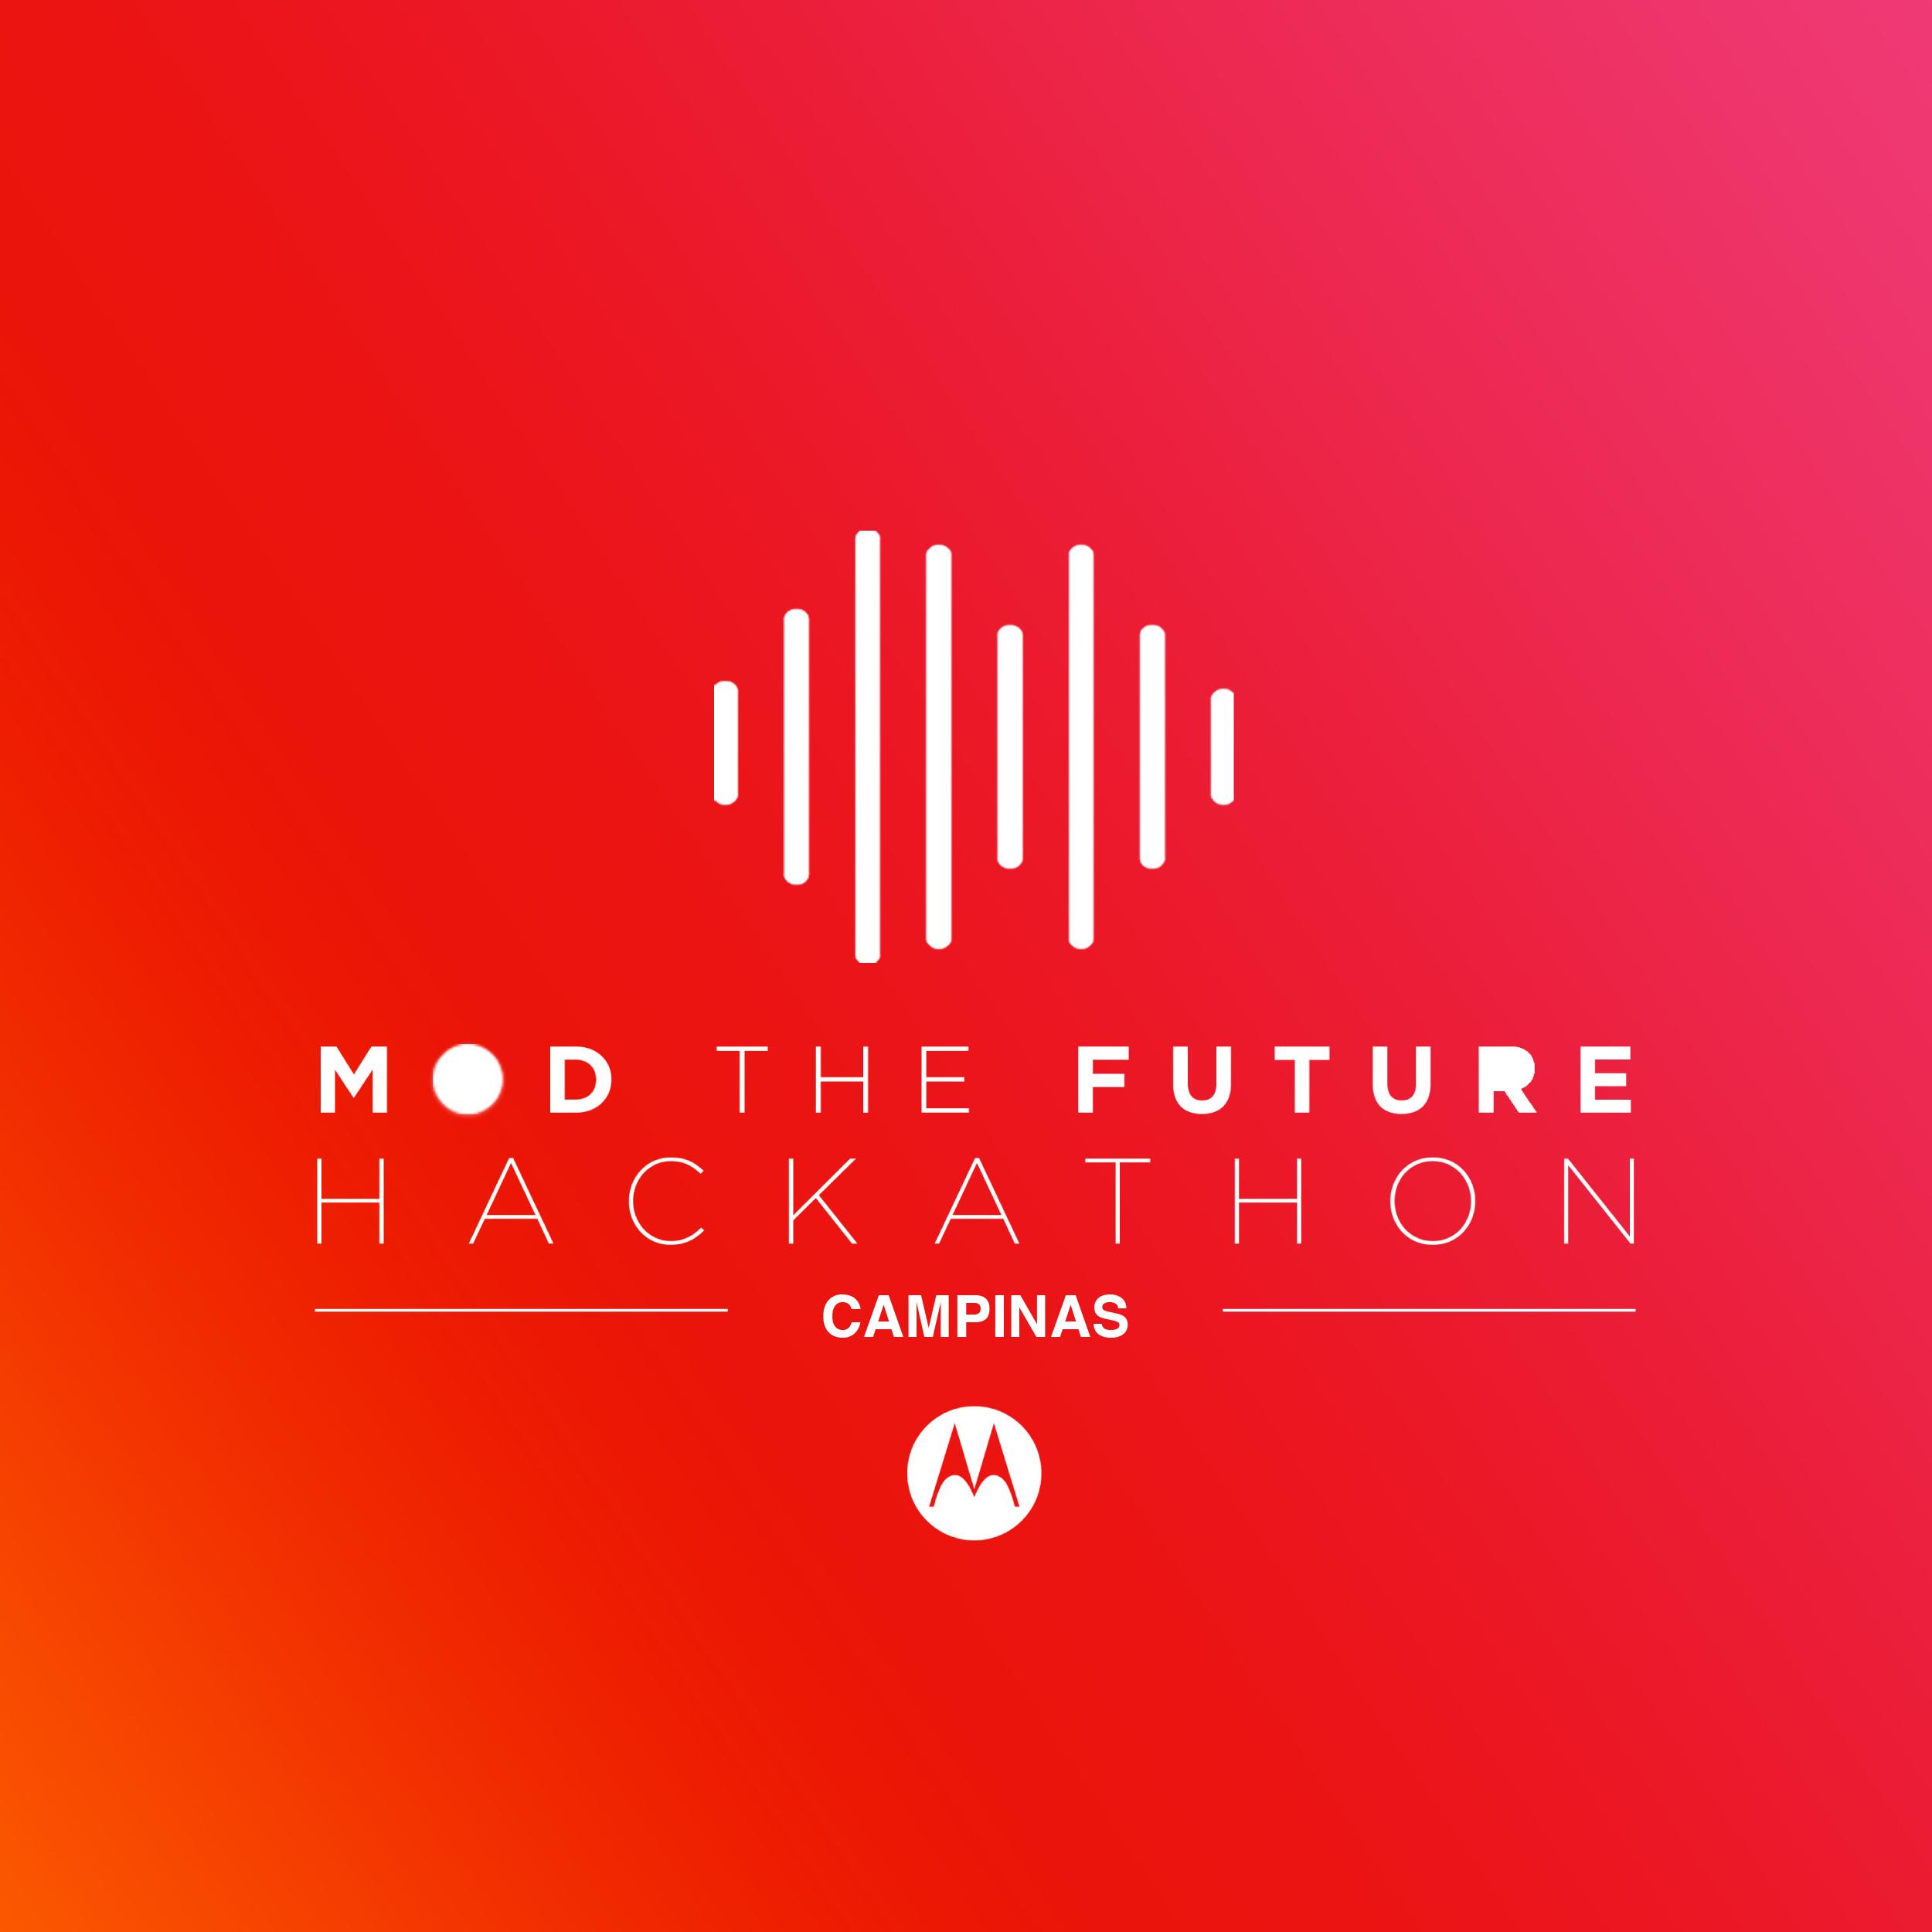 Mod The Future Campinas